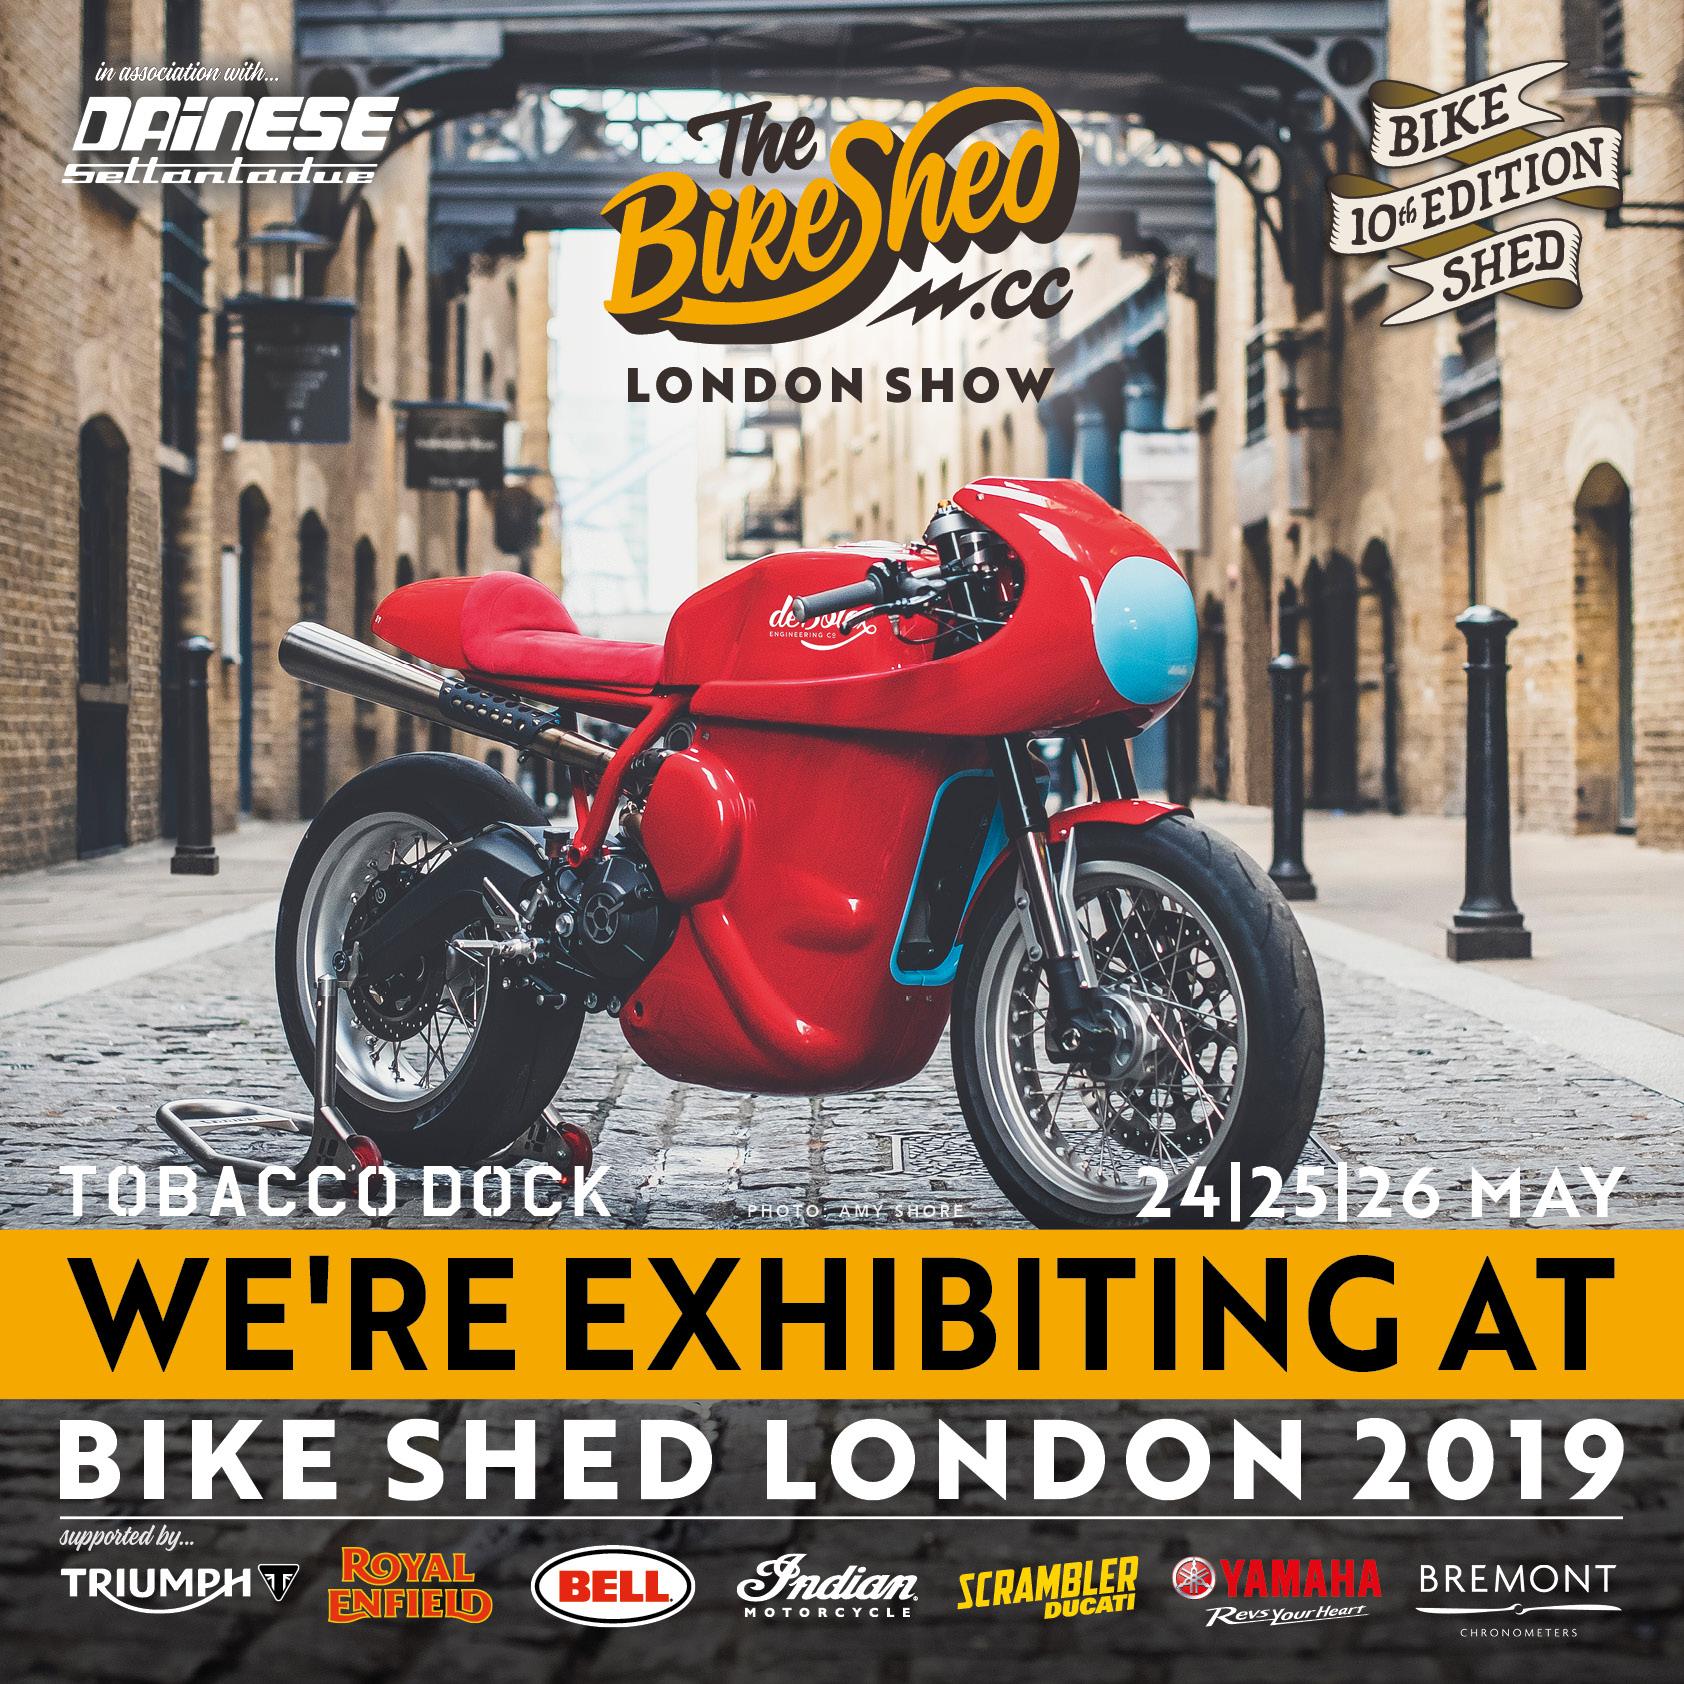 Bike Shed London Show 2019